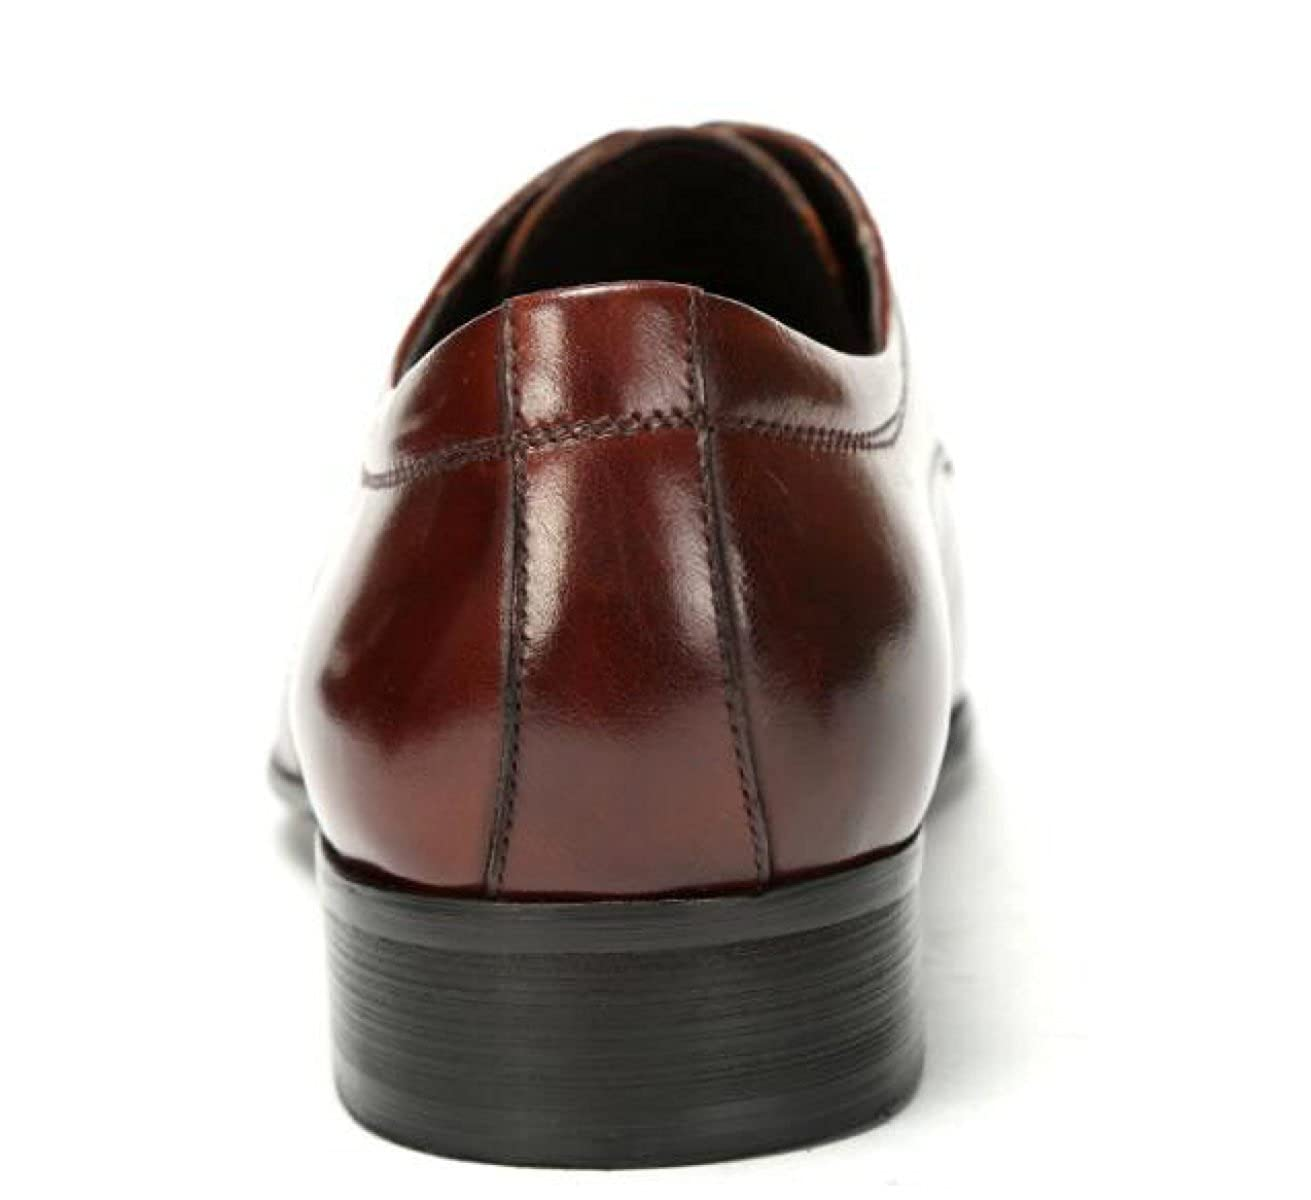 Schuhe Hochzeitsschuhe Spitzen Business Anzuge Herrenschuhe